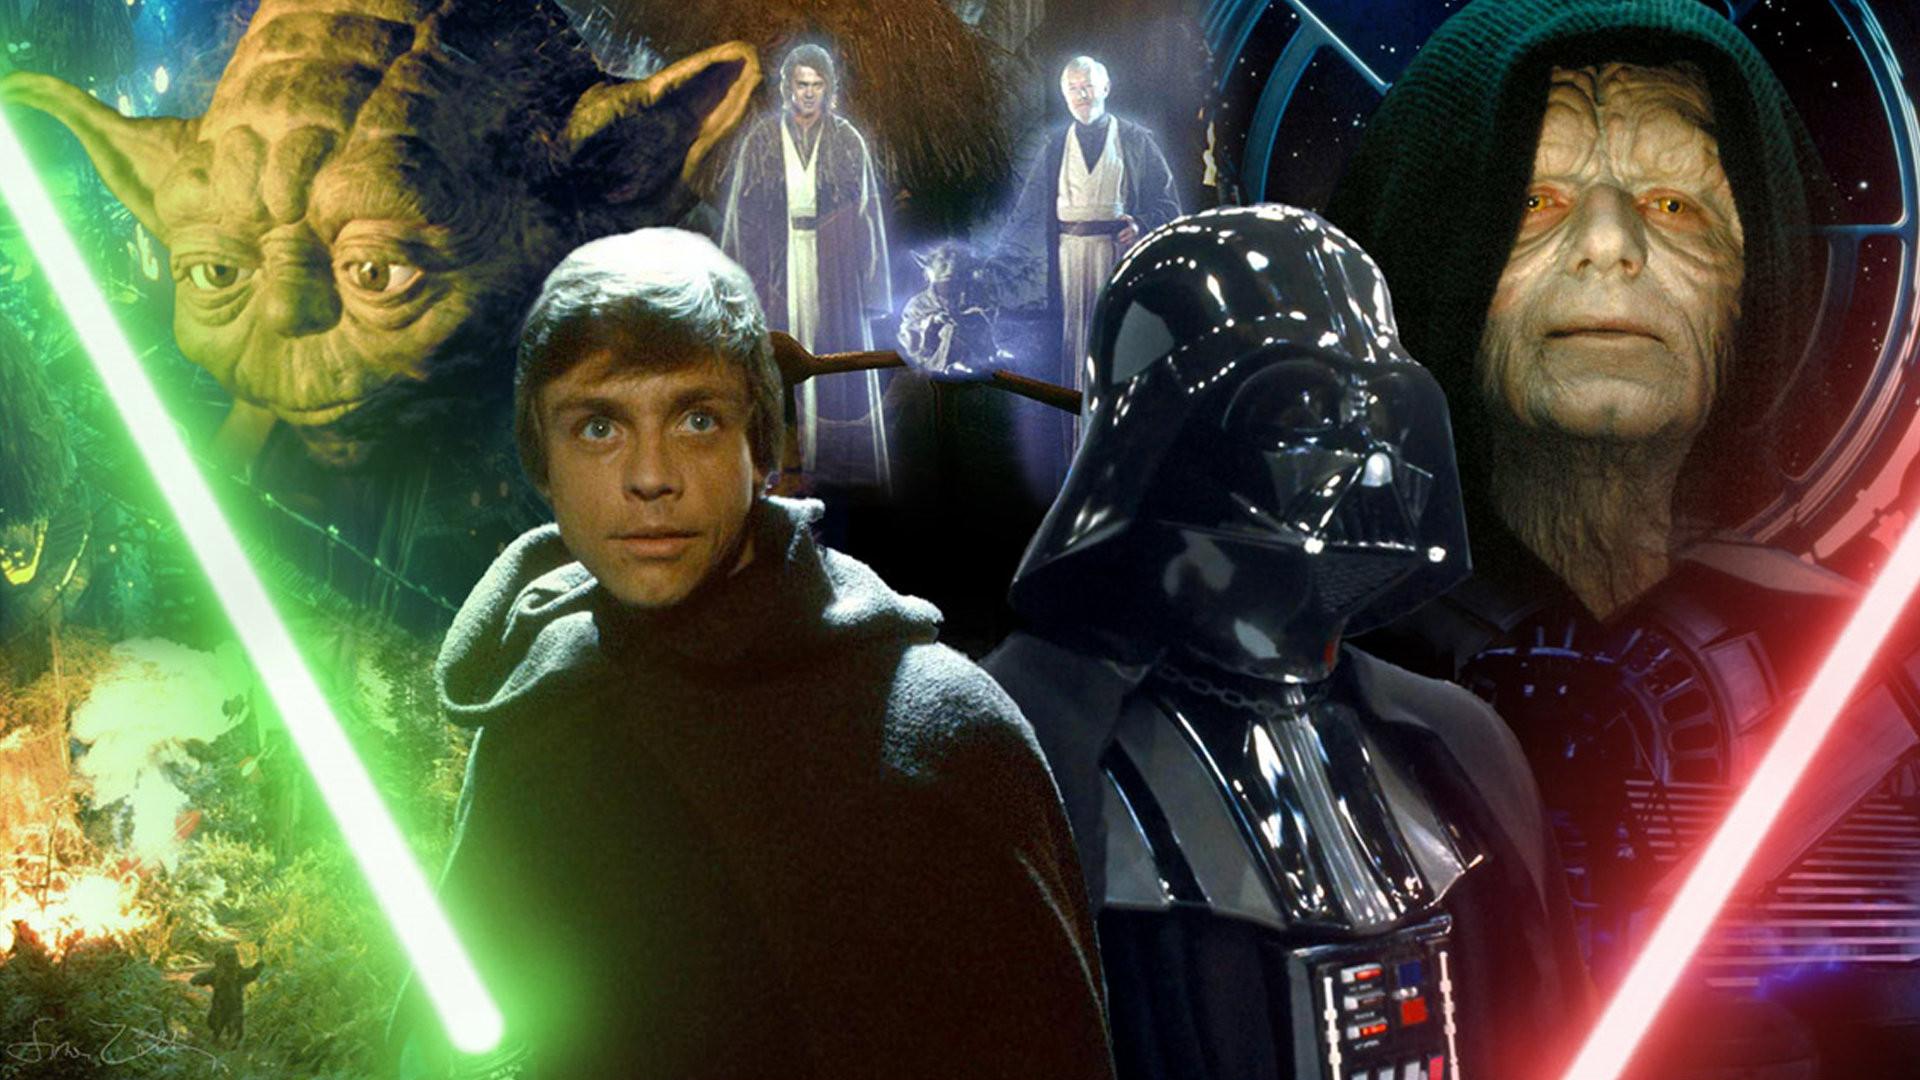 Star Wars Episode Vi Return Of The Jedi Hd Wallpaper Background Image 1920x1080 Id 507135 Wallpaper Abyss